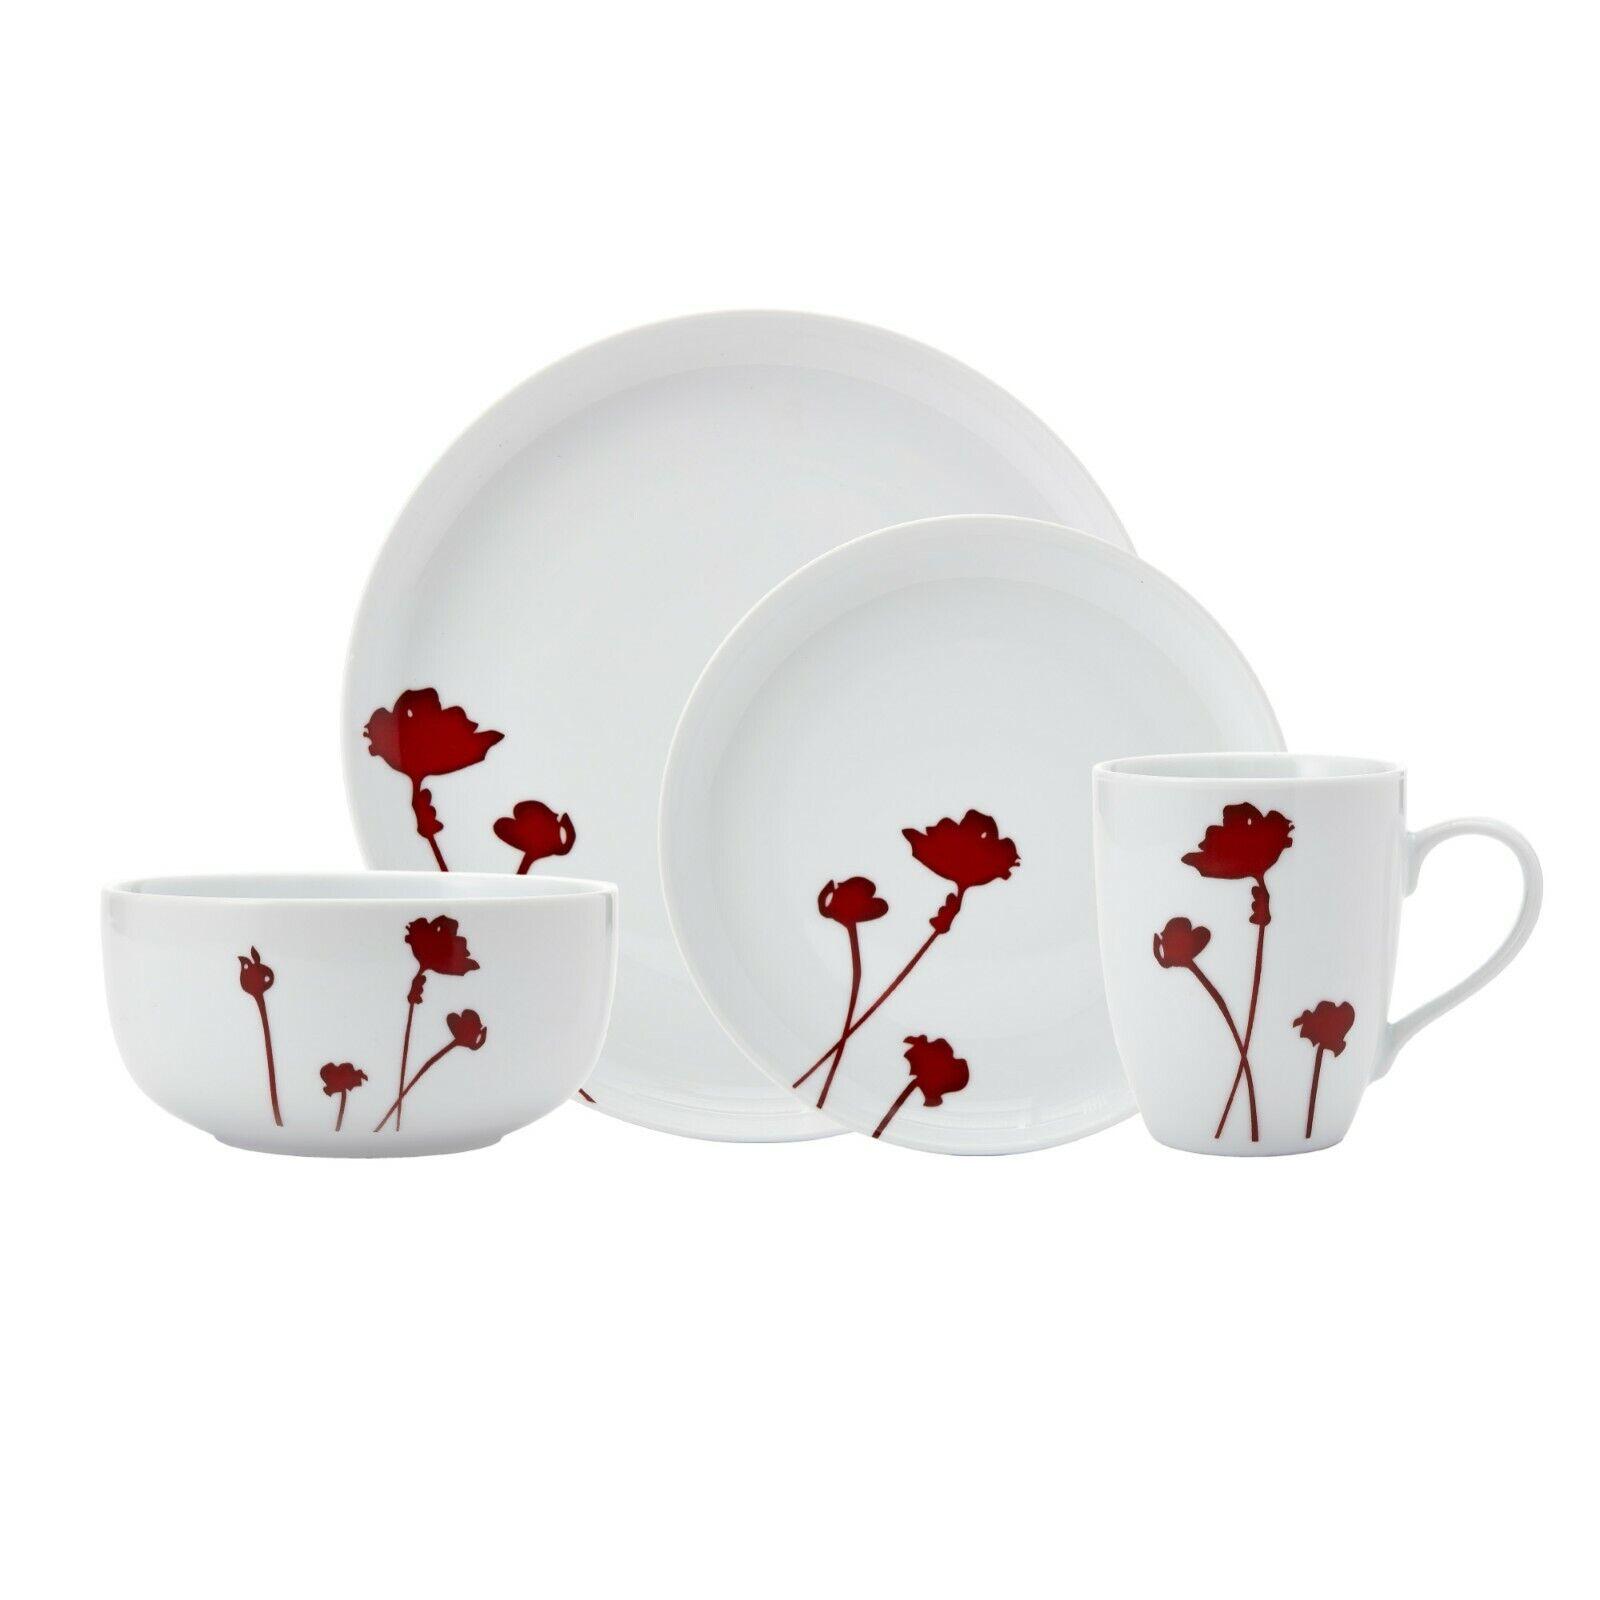 Scarlet Dining Dinnerware set for 4